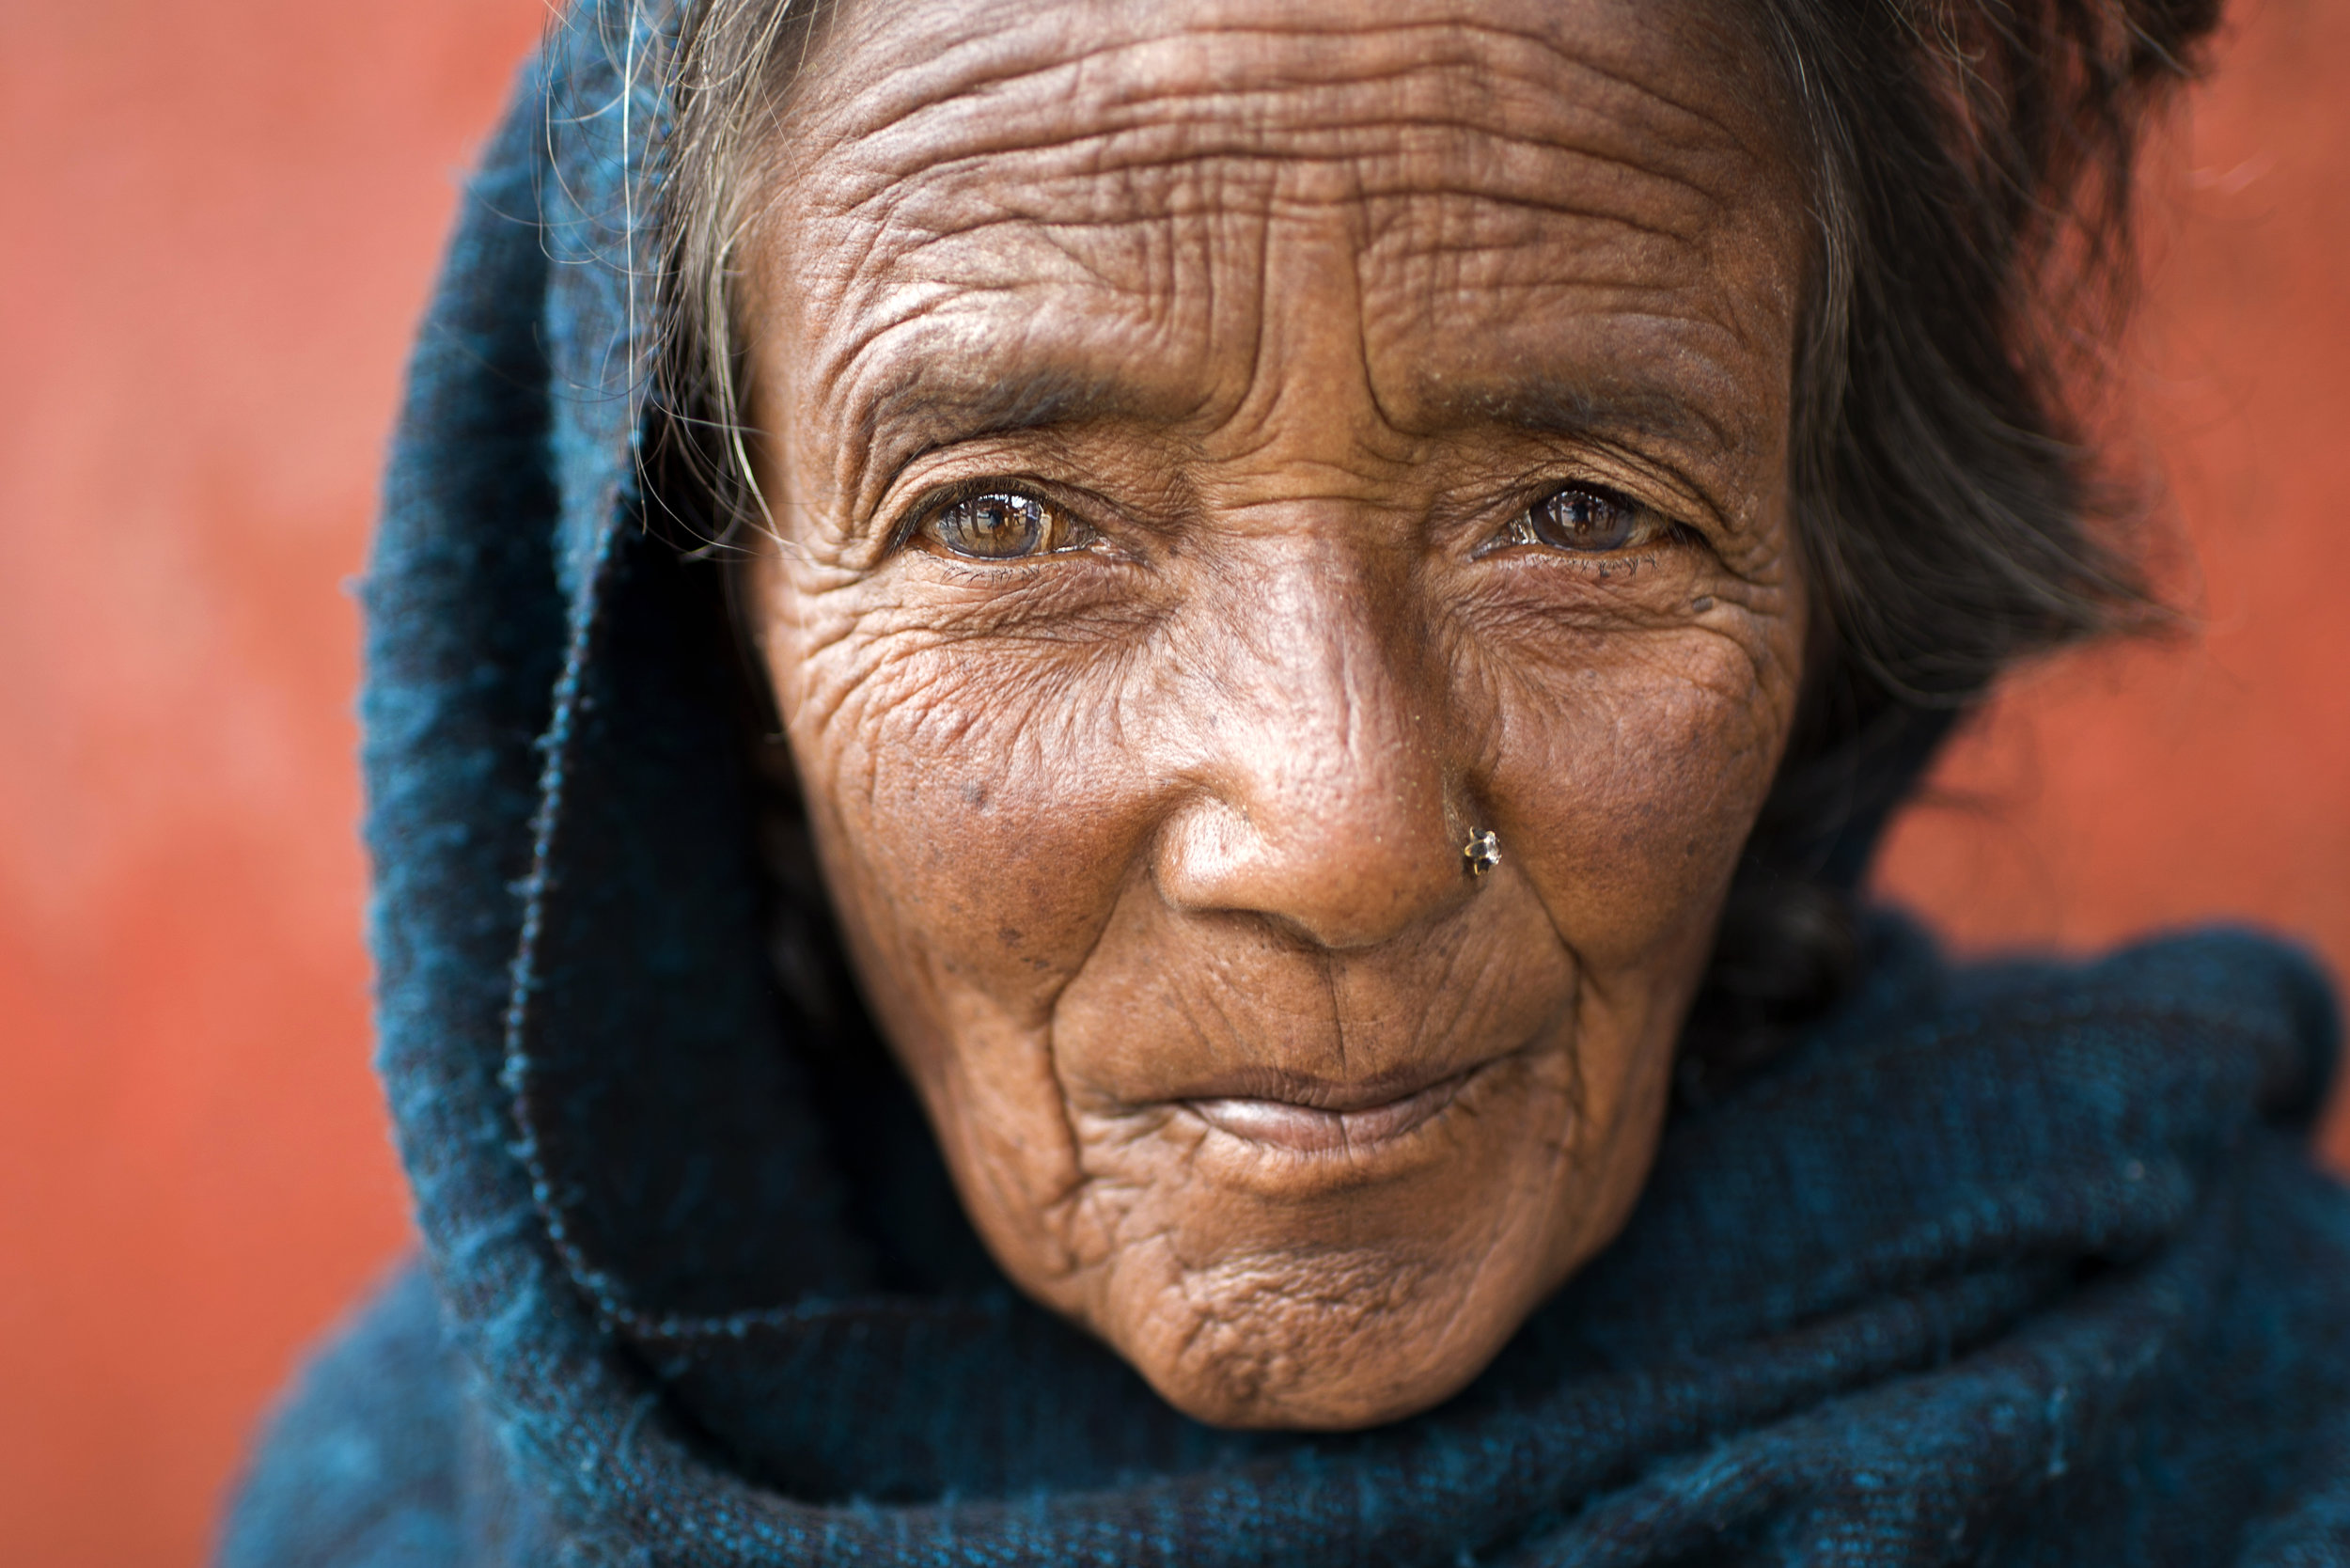 Nepal Street Portrait